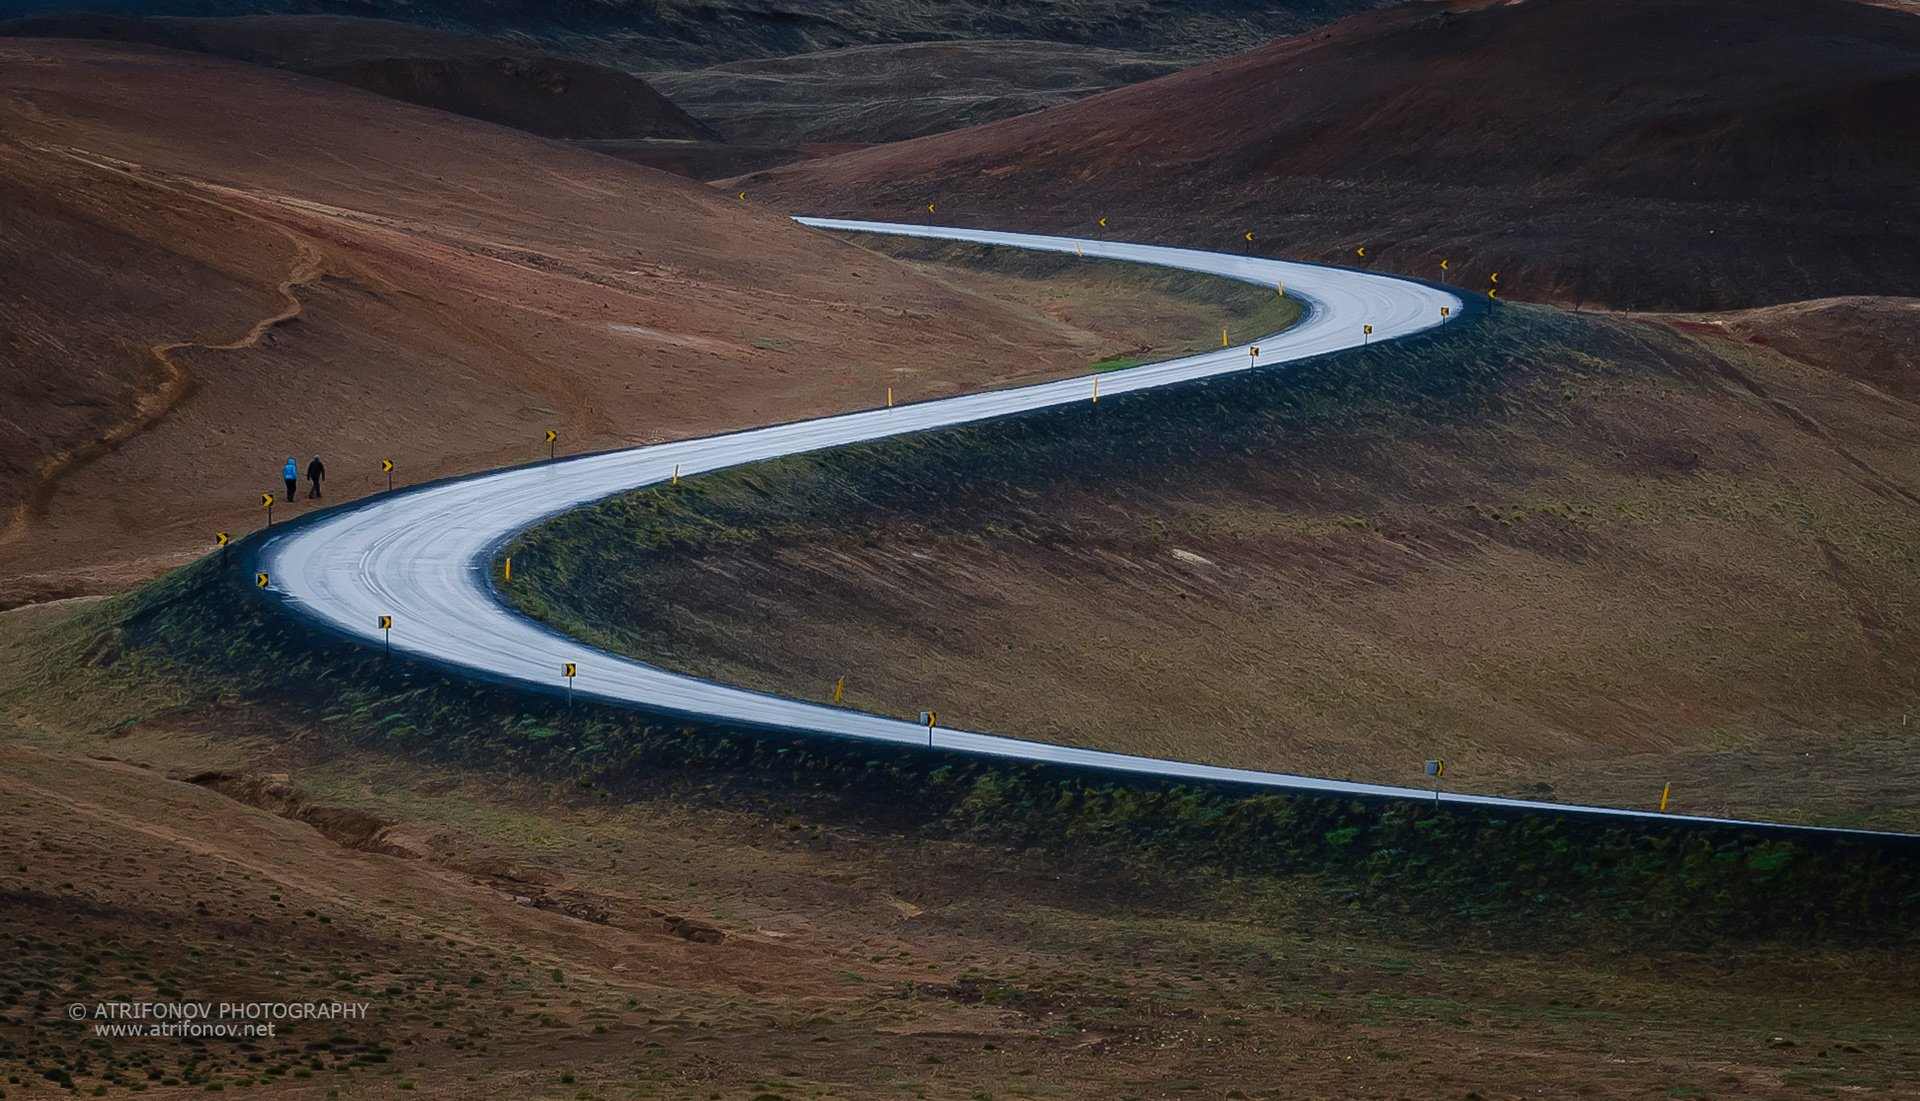 Iceland, road, travel, North Iceland, people, walking, future, lines, S- line, rainy, Namascard, Andrey Trifonov